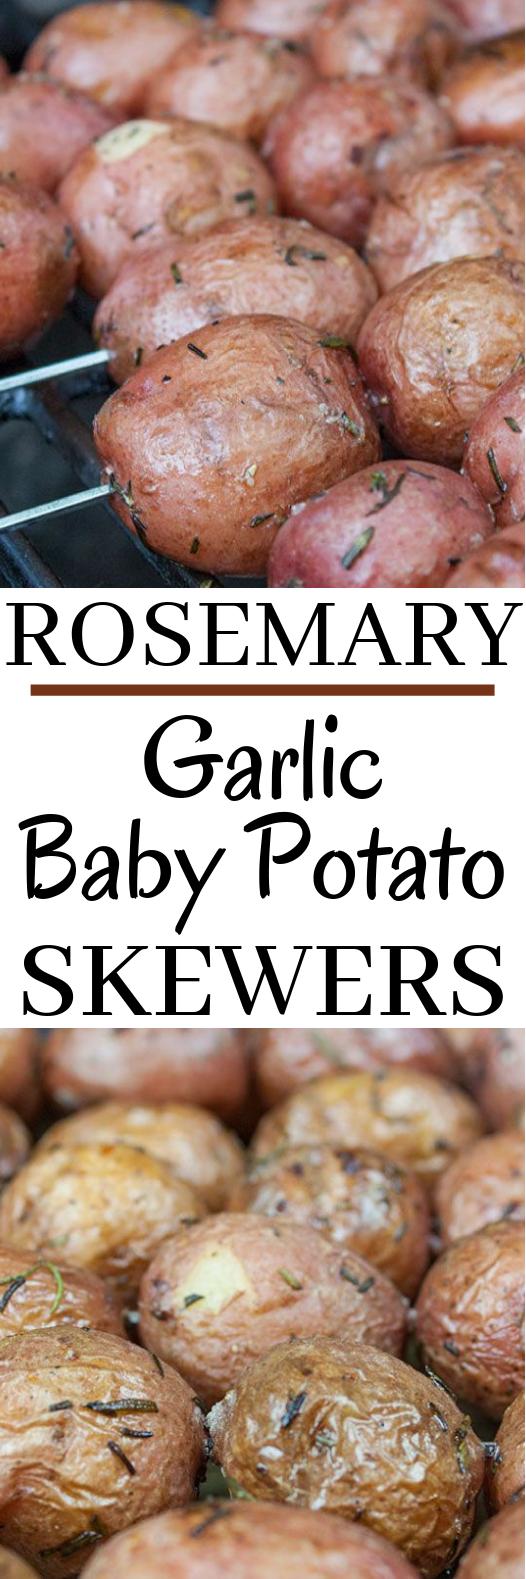 Rosemary Garlic Grilled Baby Potato Skewers #vegetarian #grilling